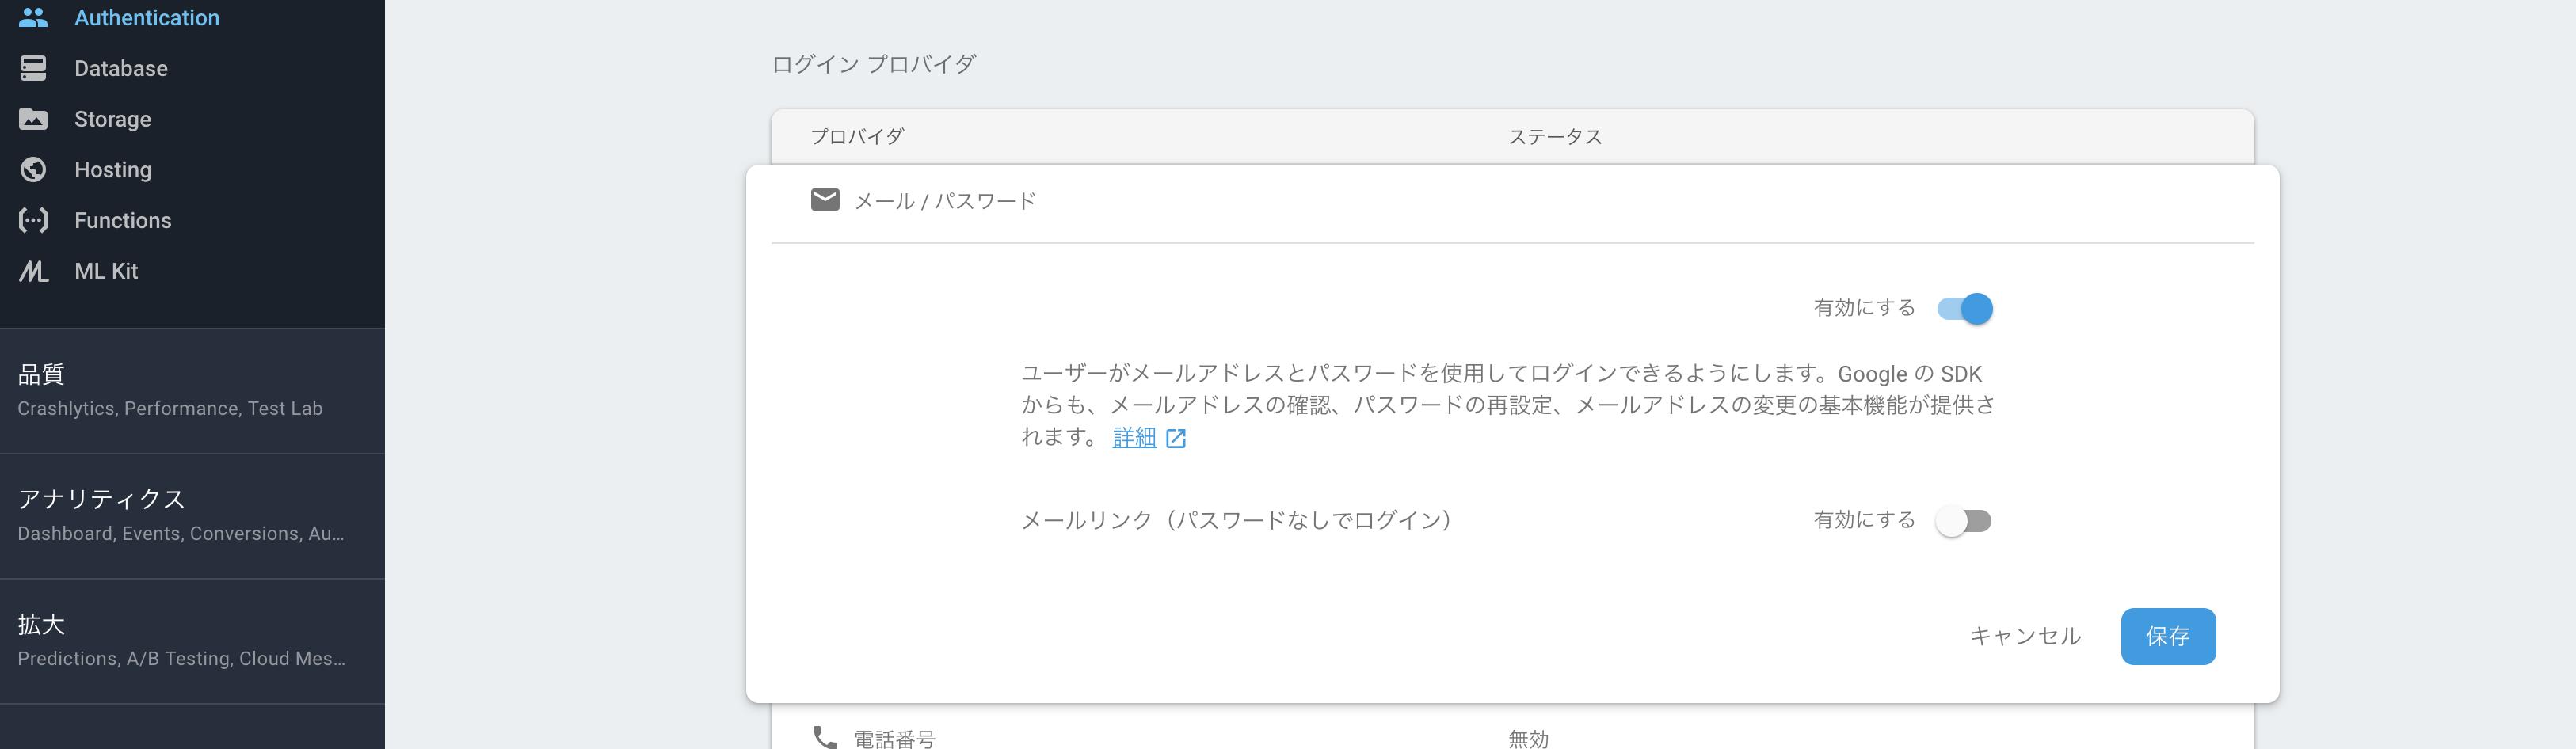 FireShot Capture 85 - gemini – Authentication – Firebase con_ - https___console.firebase.google.co.png